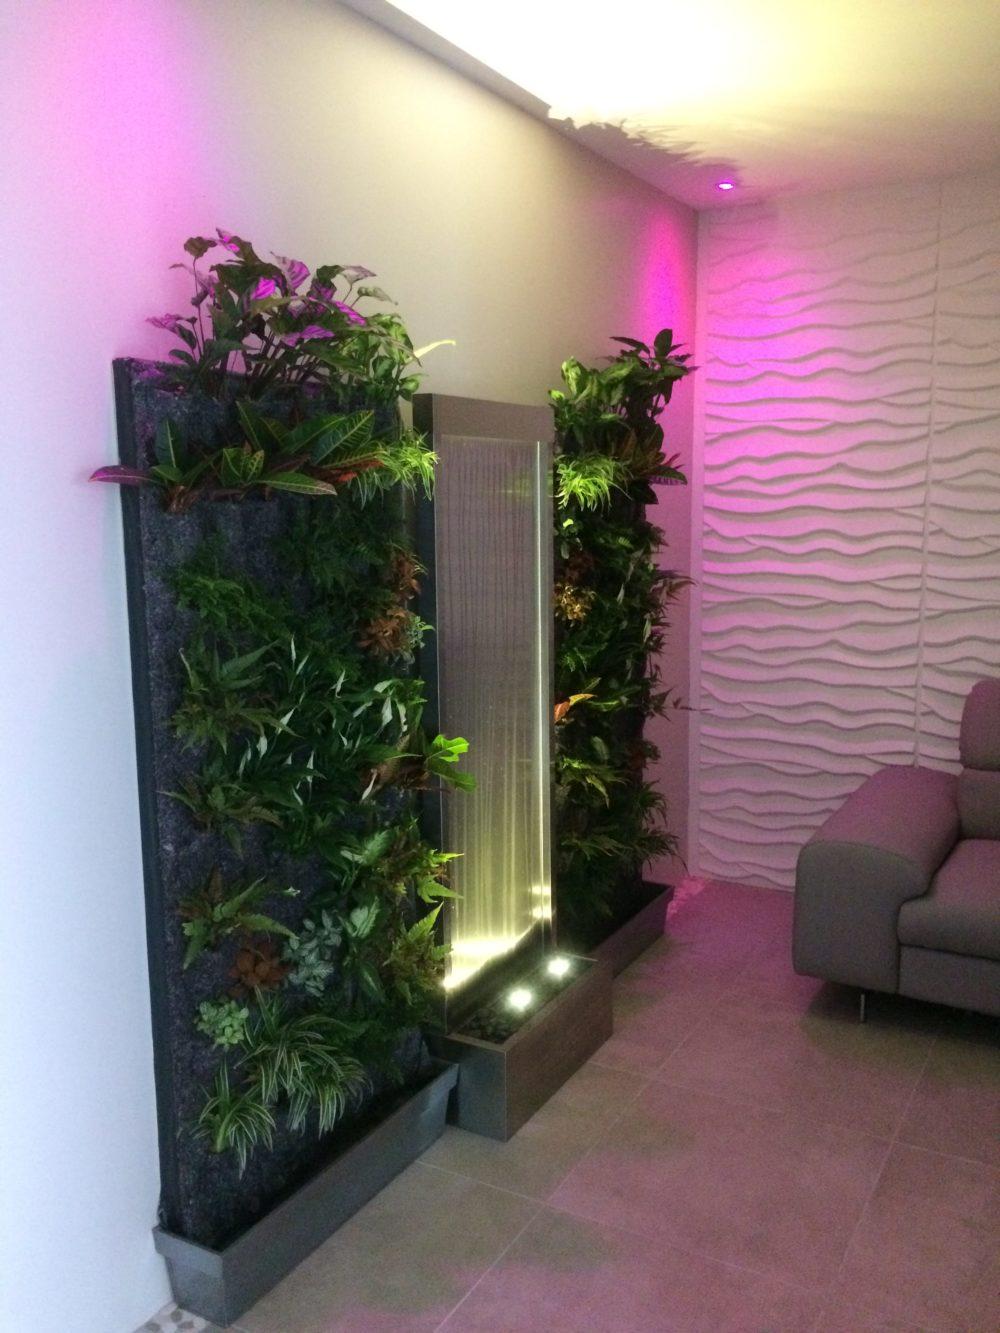 Audacieuse Agencement & décoration intérieur Espace Sauna Spa Hammam Calais XO-62